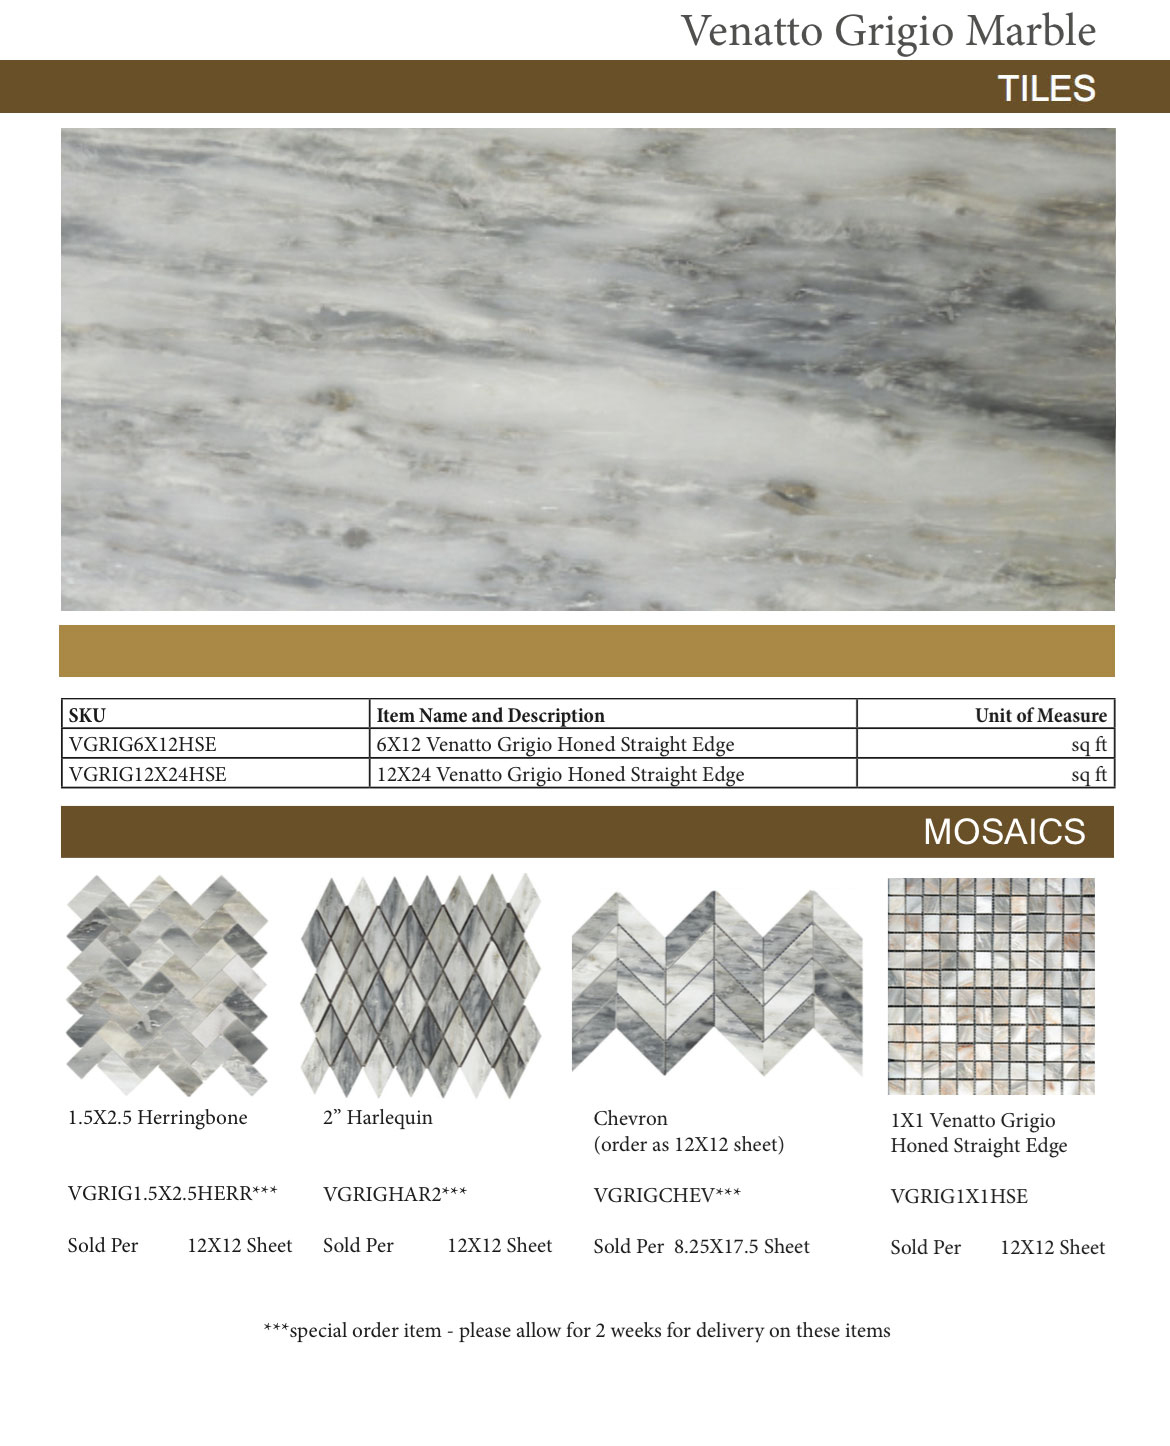 Venatto-Grigio-Marble-Tiles-and-Mosaics